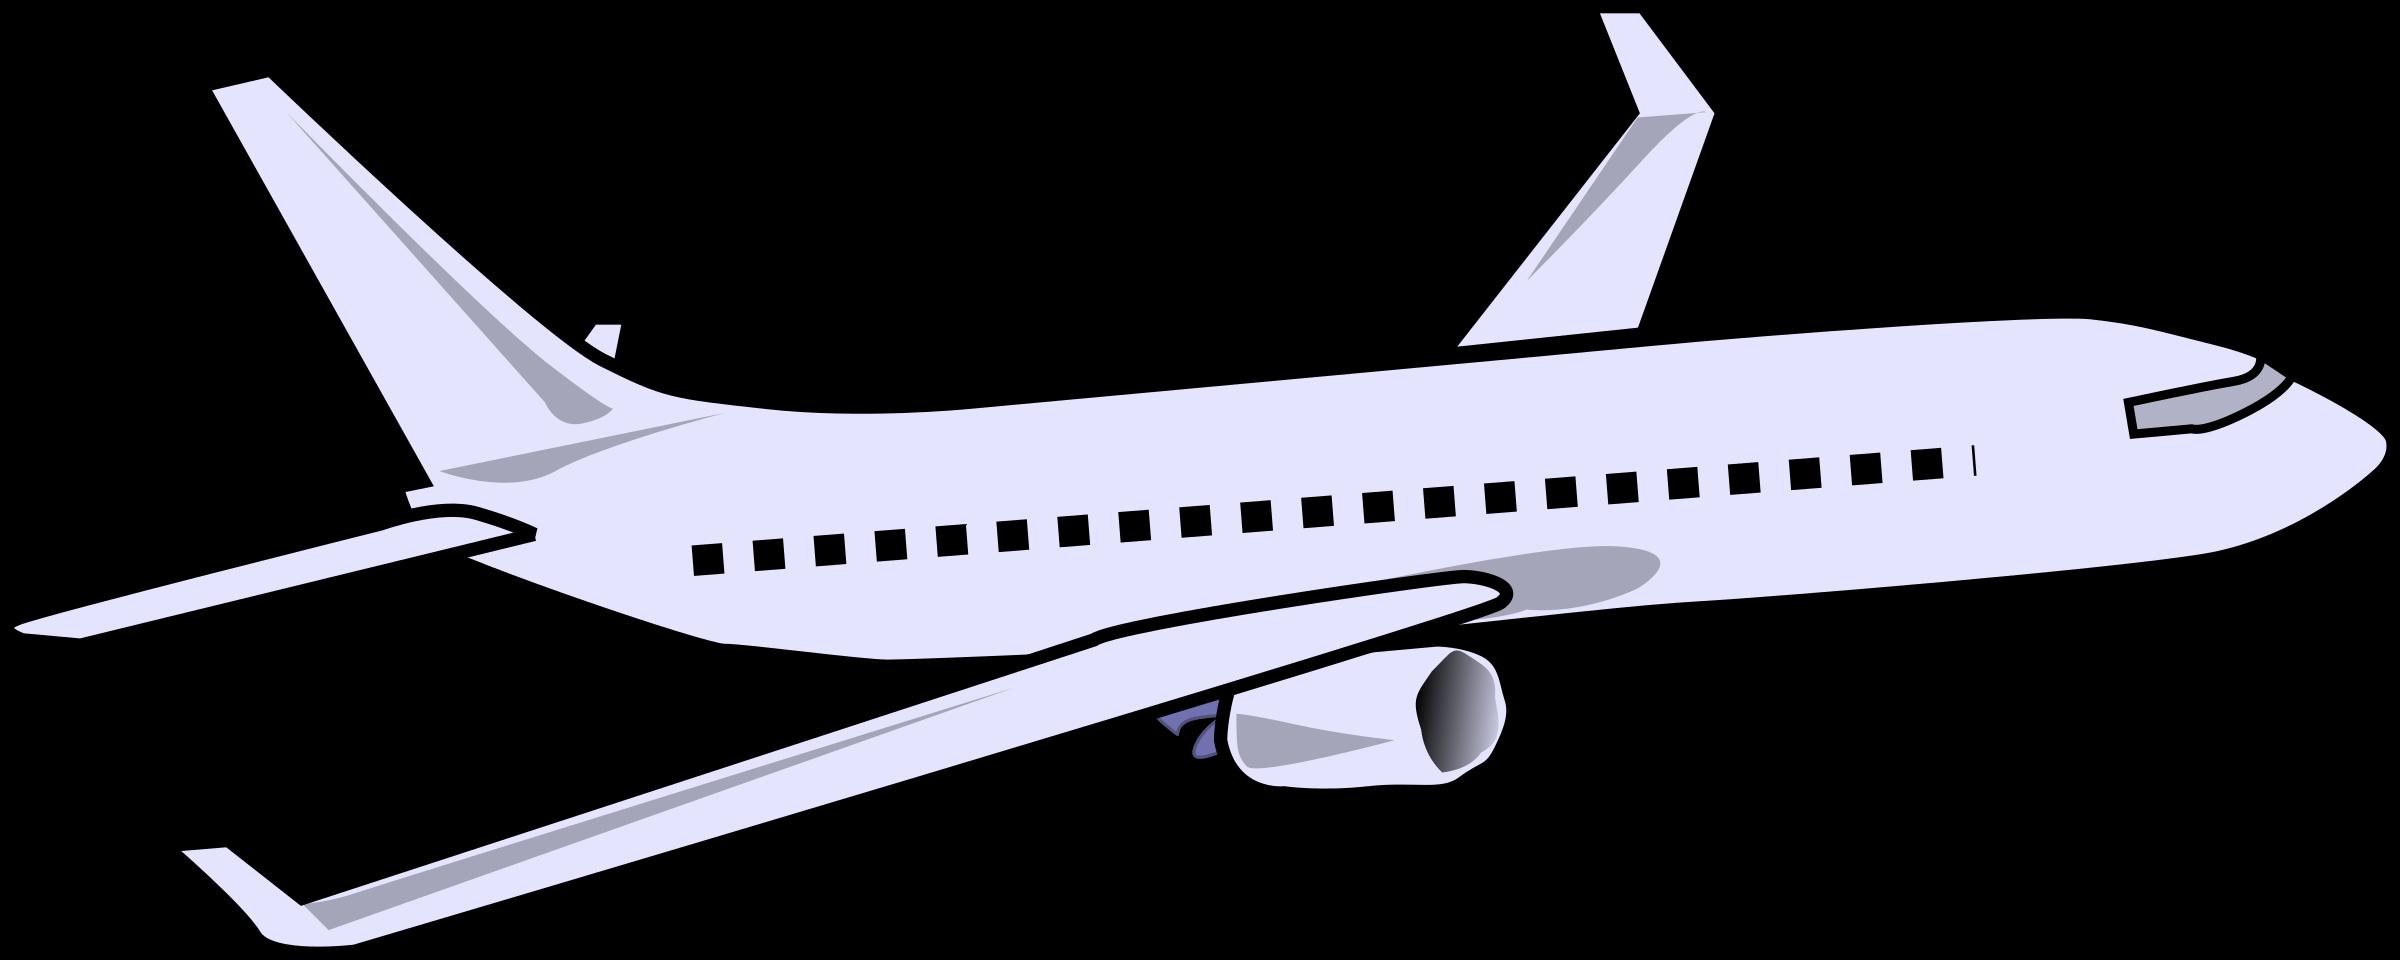 Aircraft big image png. Jet clipart printable